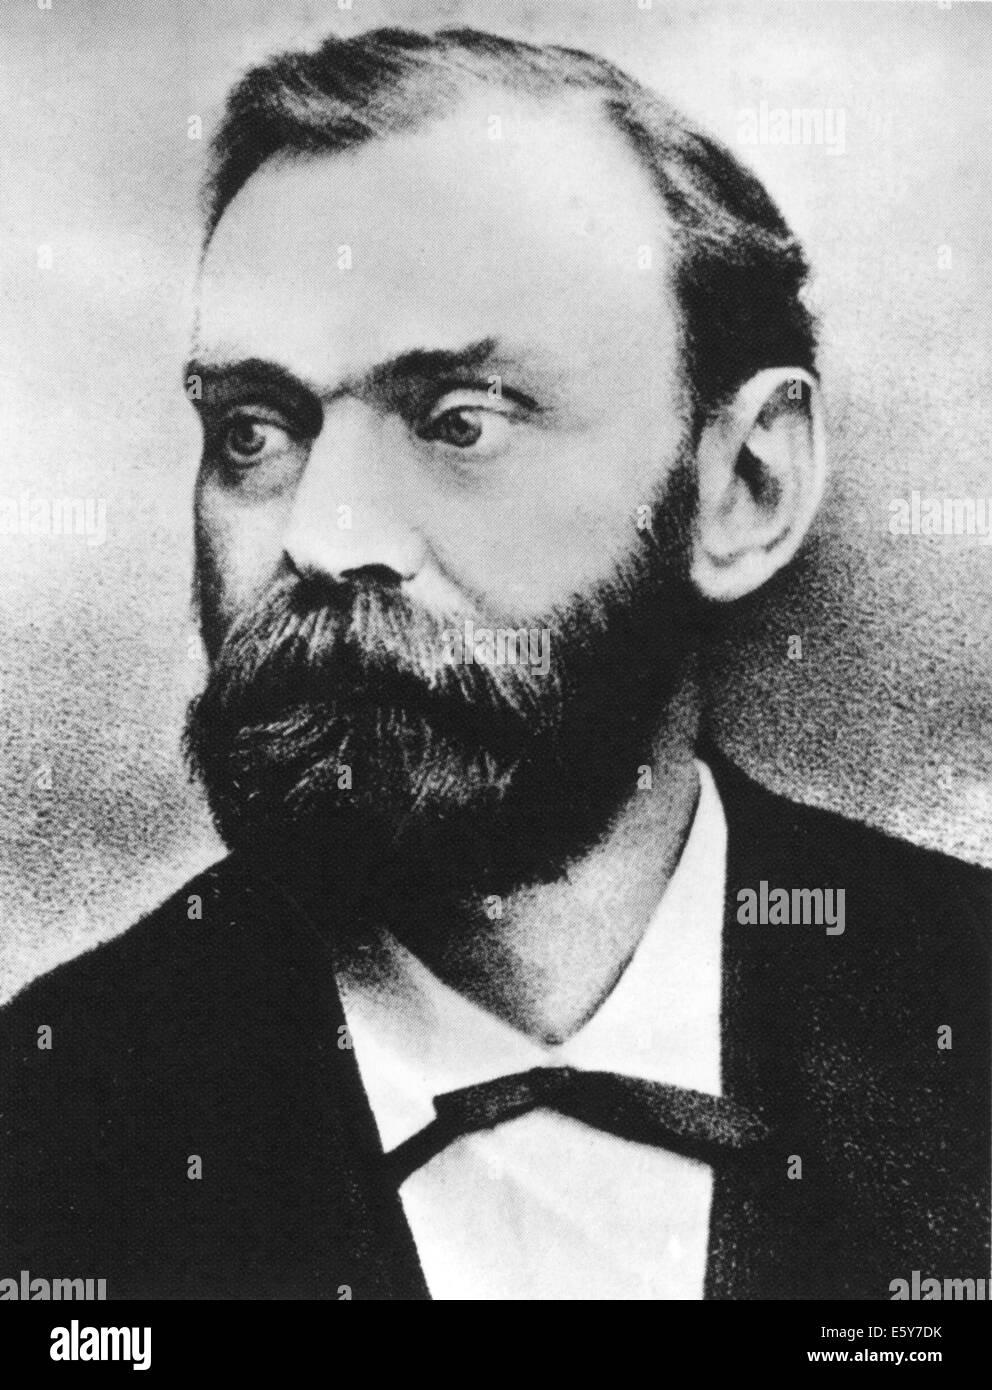 ALFRED NOBEL (1833-1896) Swedish Chemist Who Invented